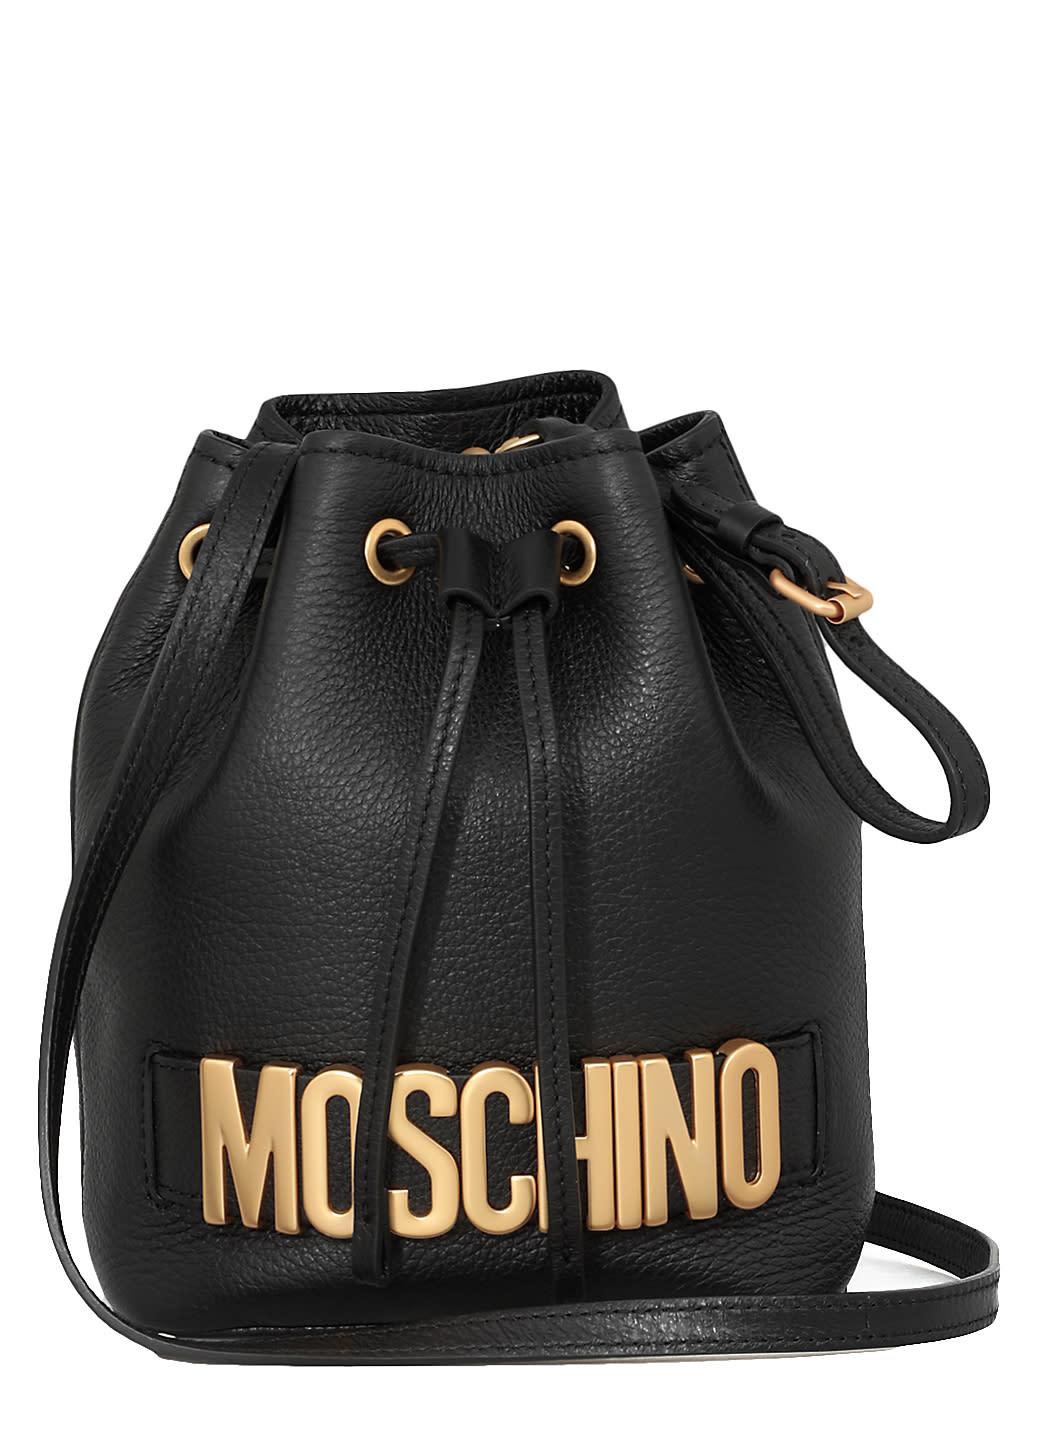 Moschino Leathers BUCKET BAG WITH LOGO